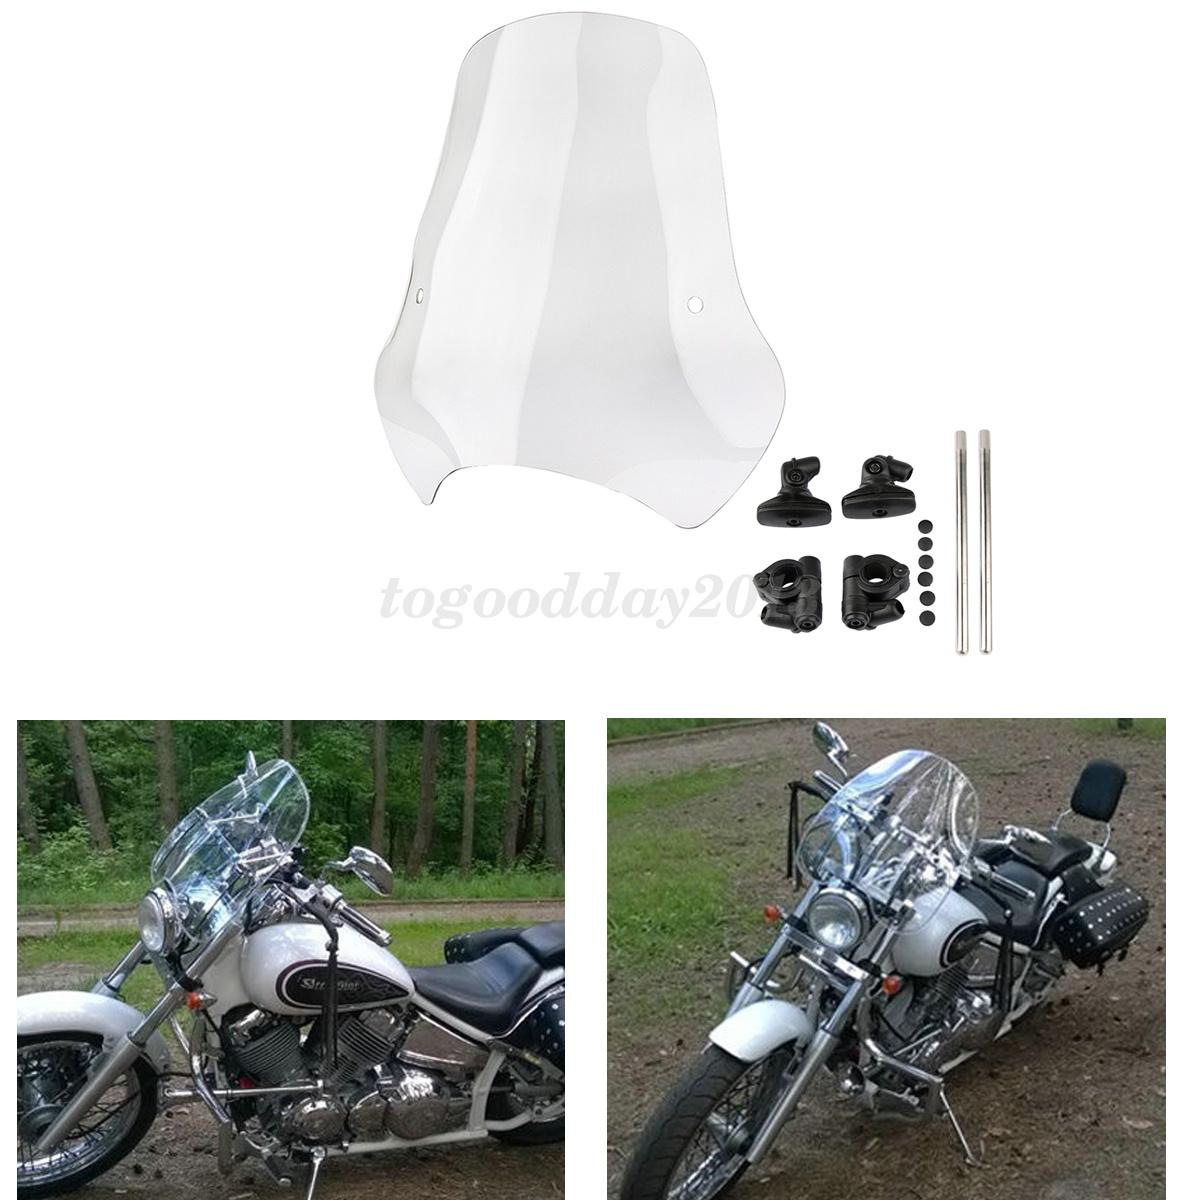 Motorcycle Windshield Windscreen 7 8 1 Handlebar Mount Hardware For Harley Ebay